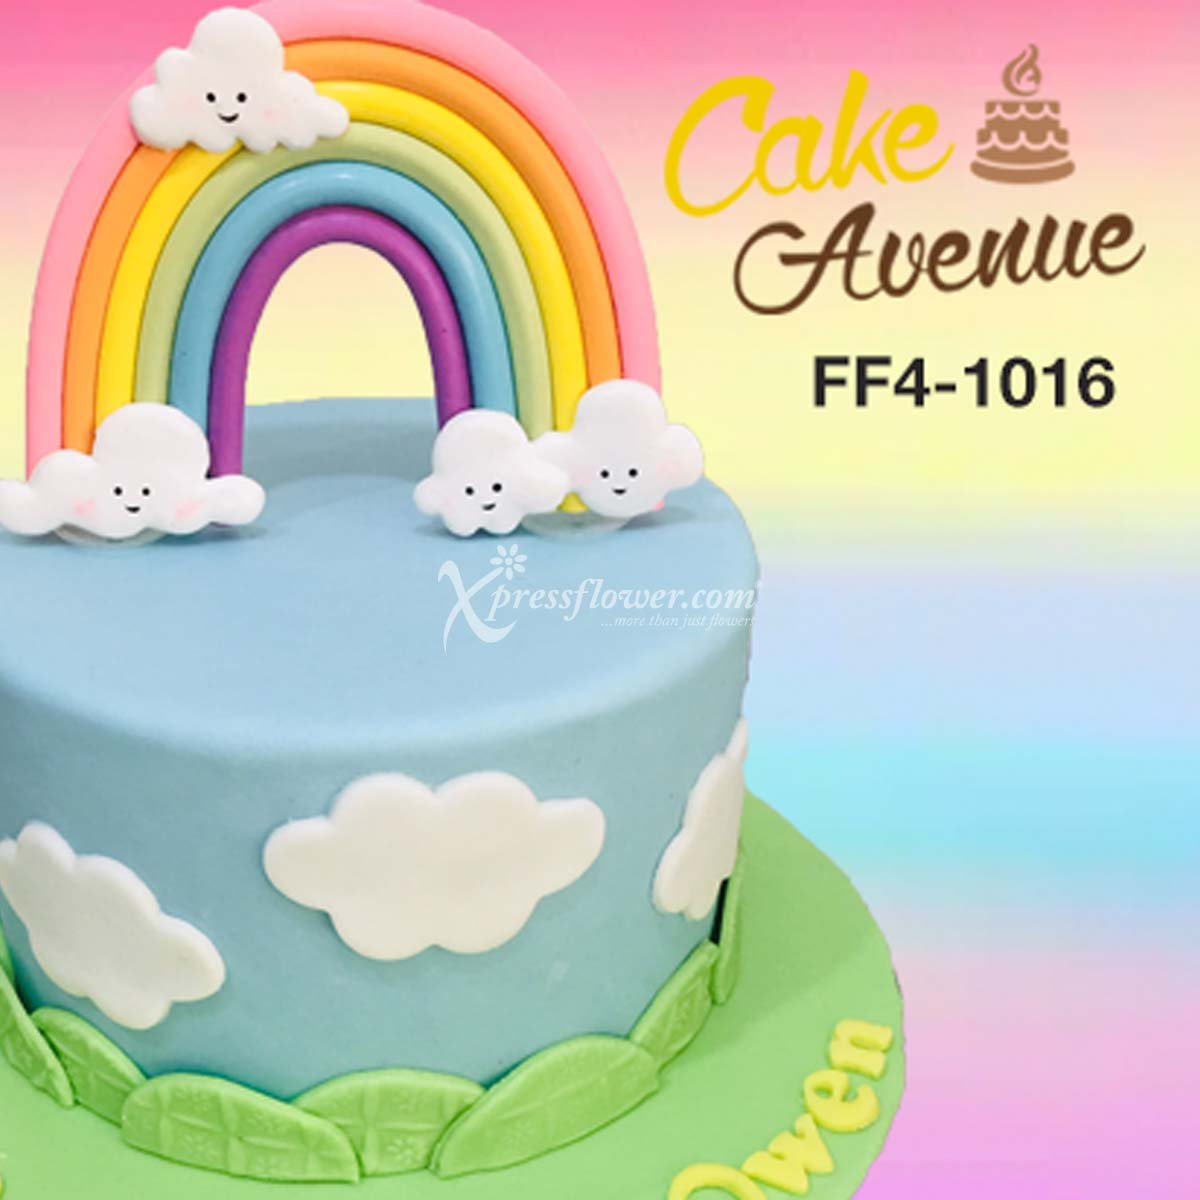 Single Tier Rainbow (Cake Avenue)